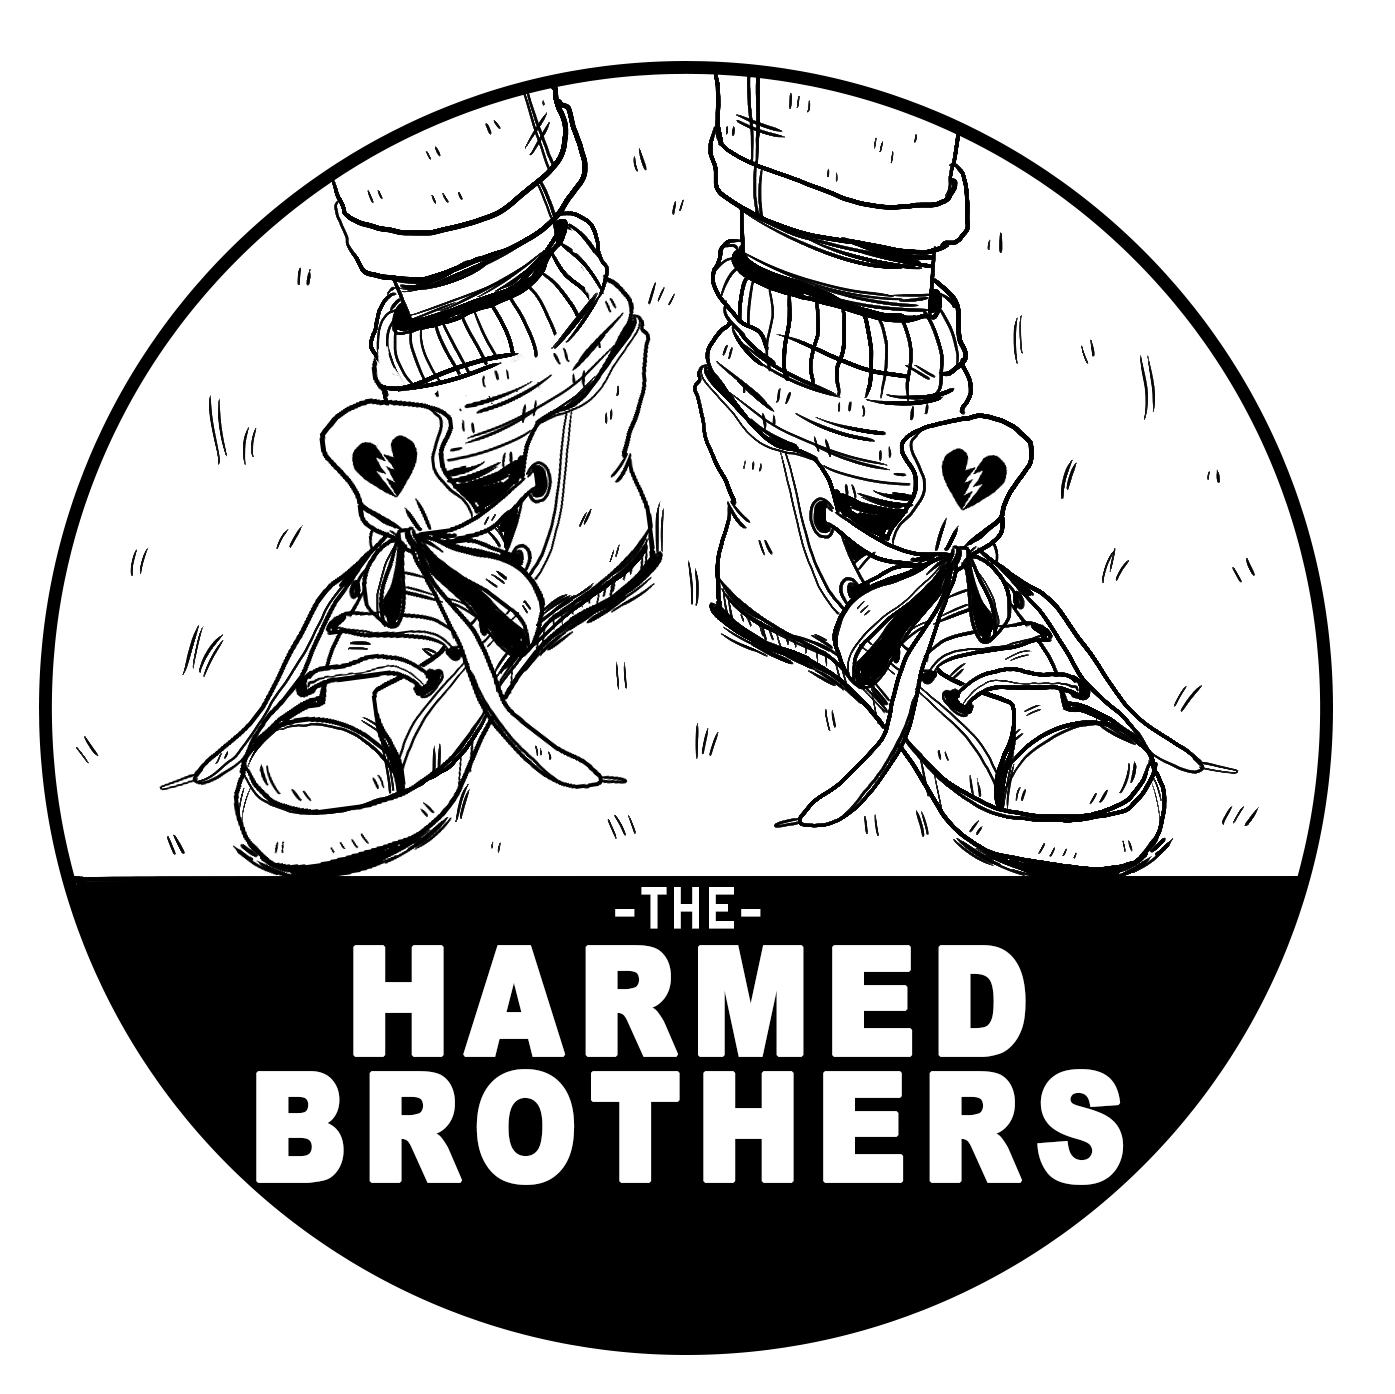 harm bros 2.jpg